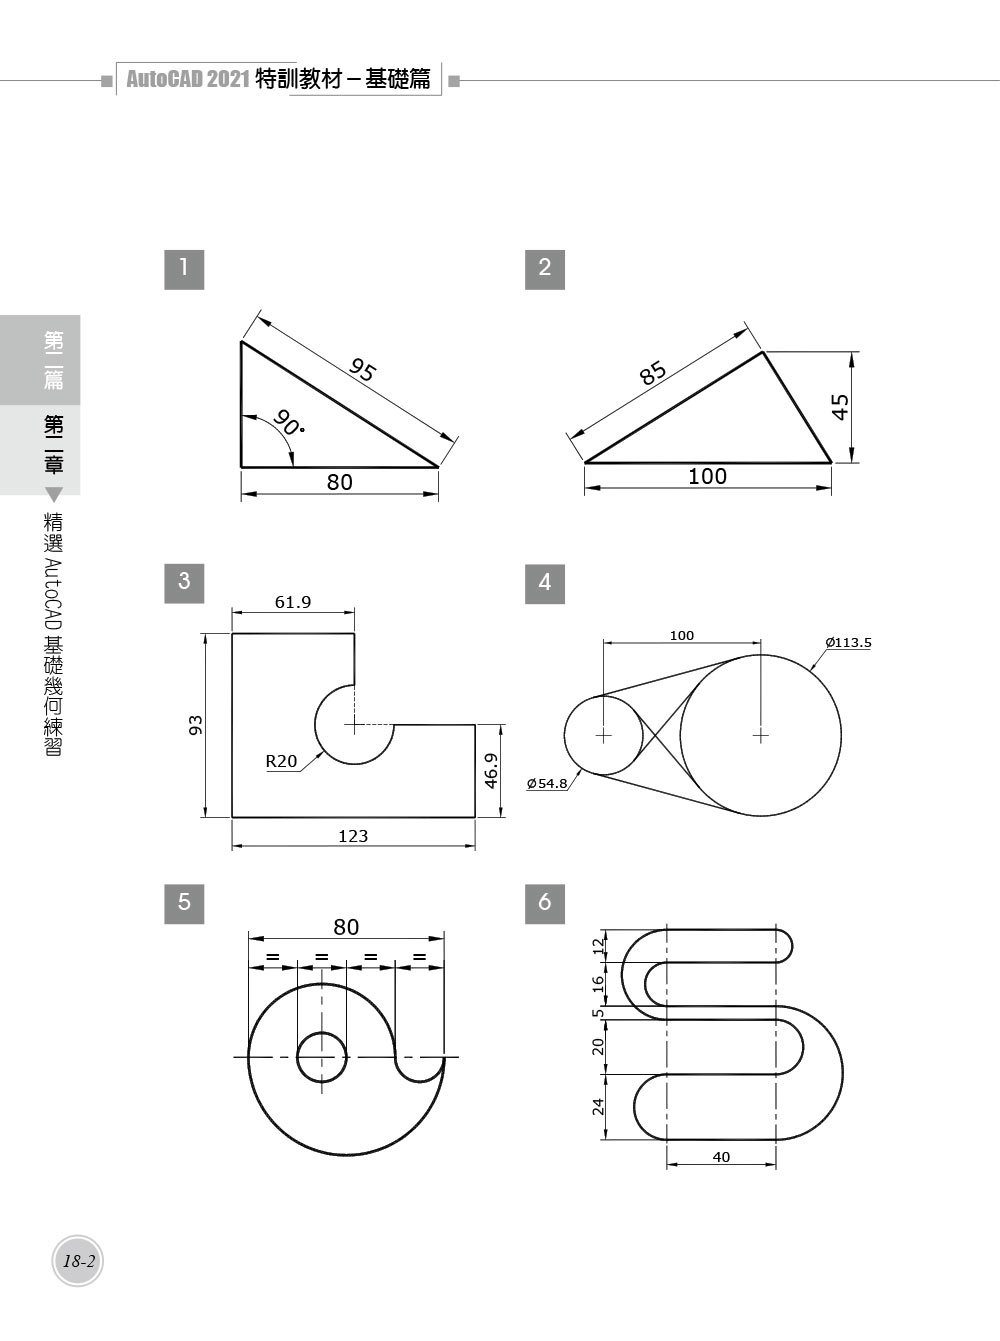 TQC+ AutoCAD 2021 特訓教材 -- 基礎篇 (隨書附贈102個精彩繪圖心法動態教學檔)-preview-8